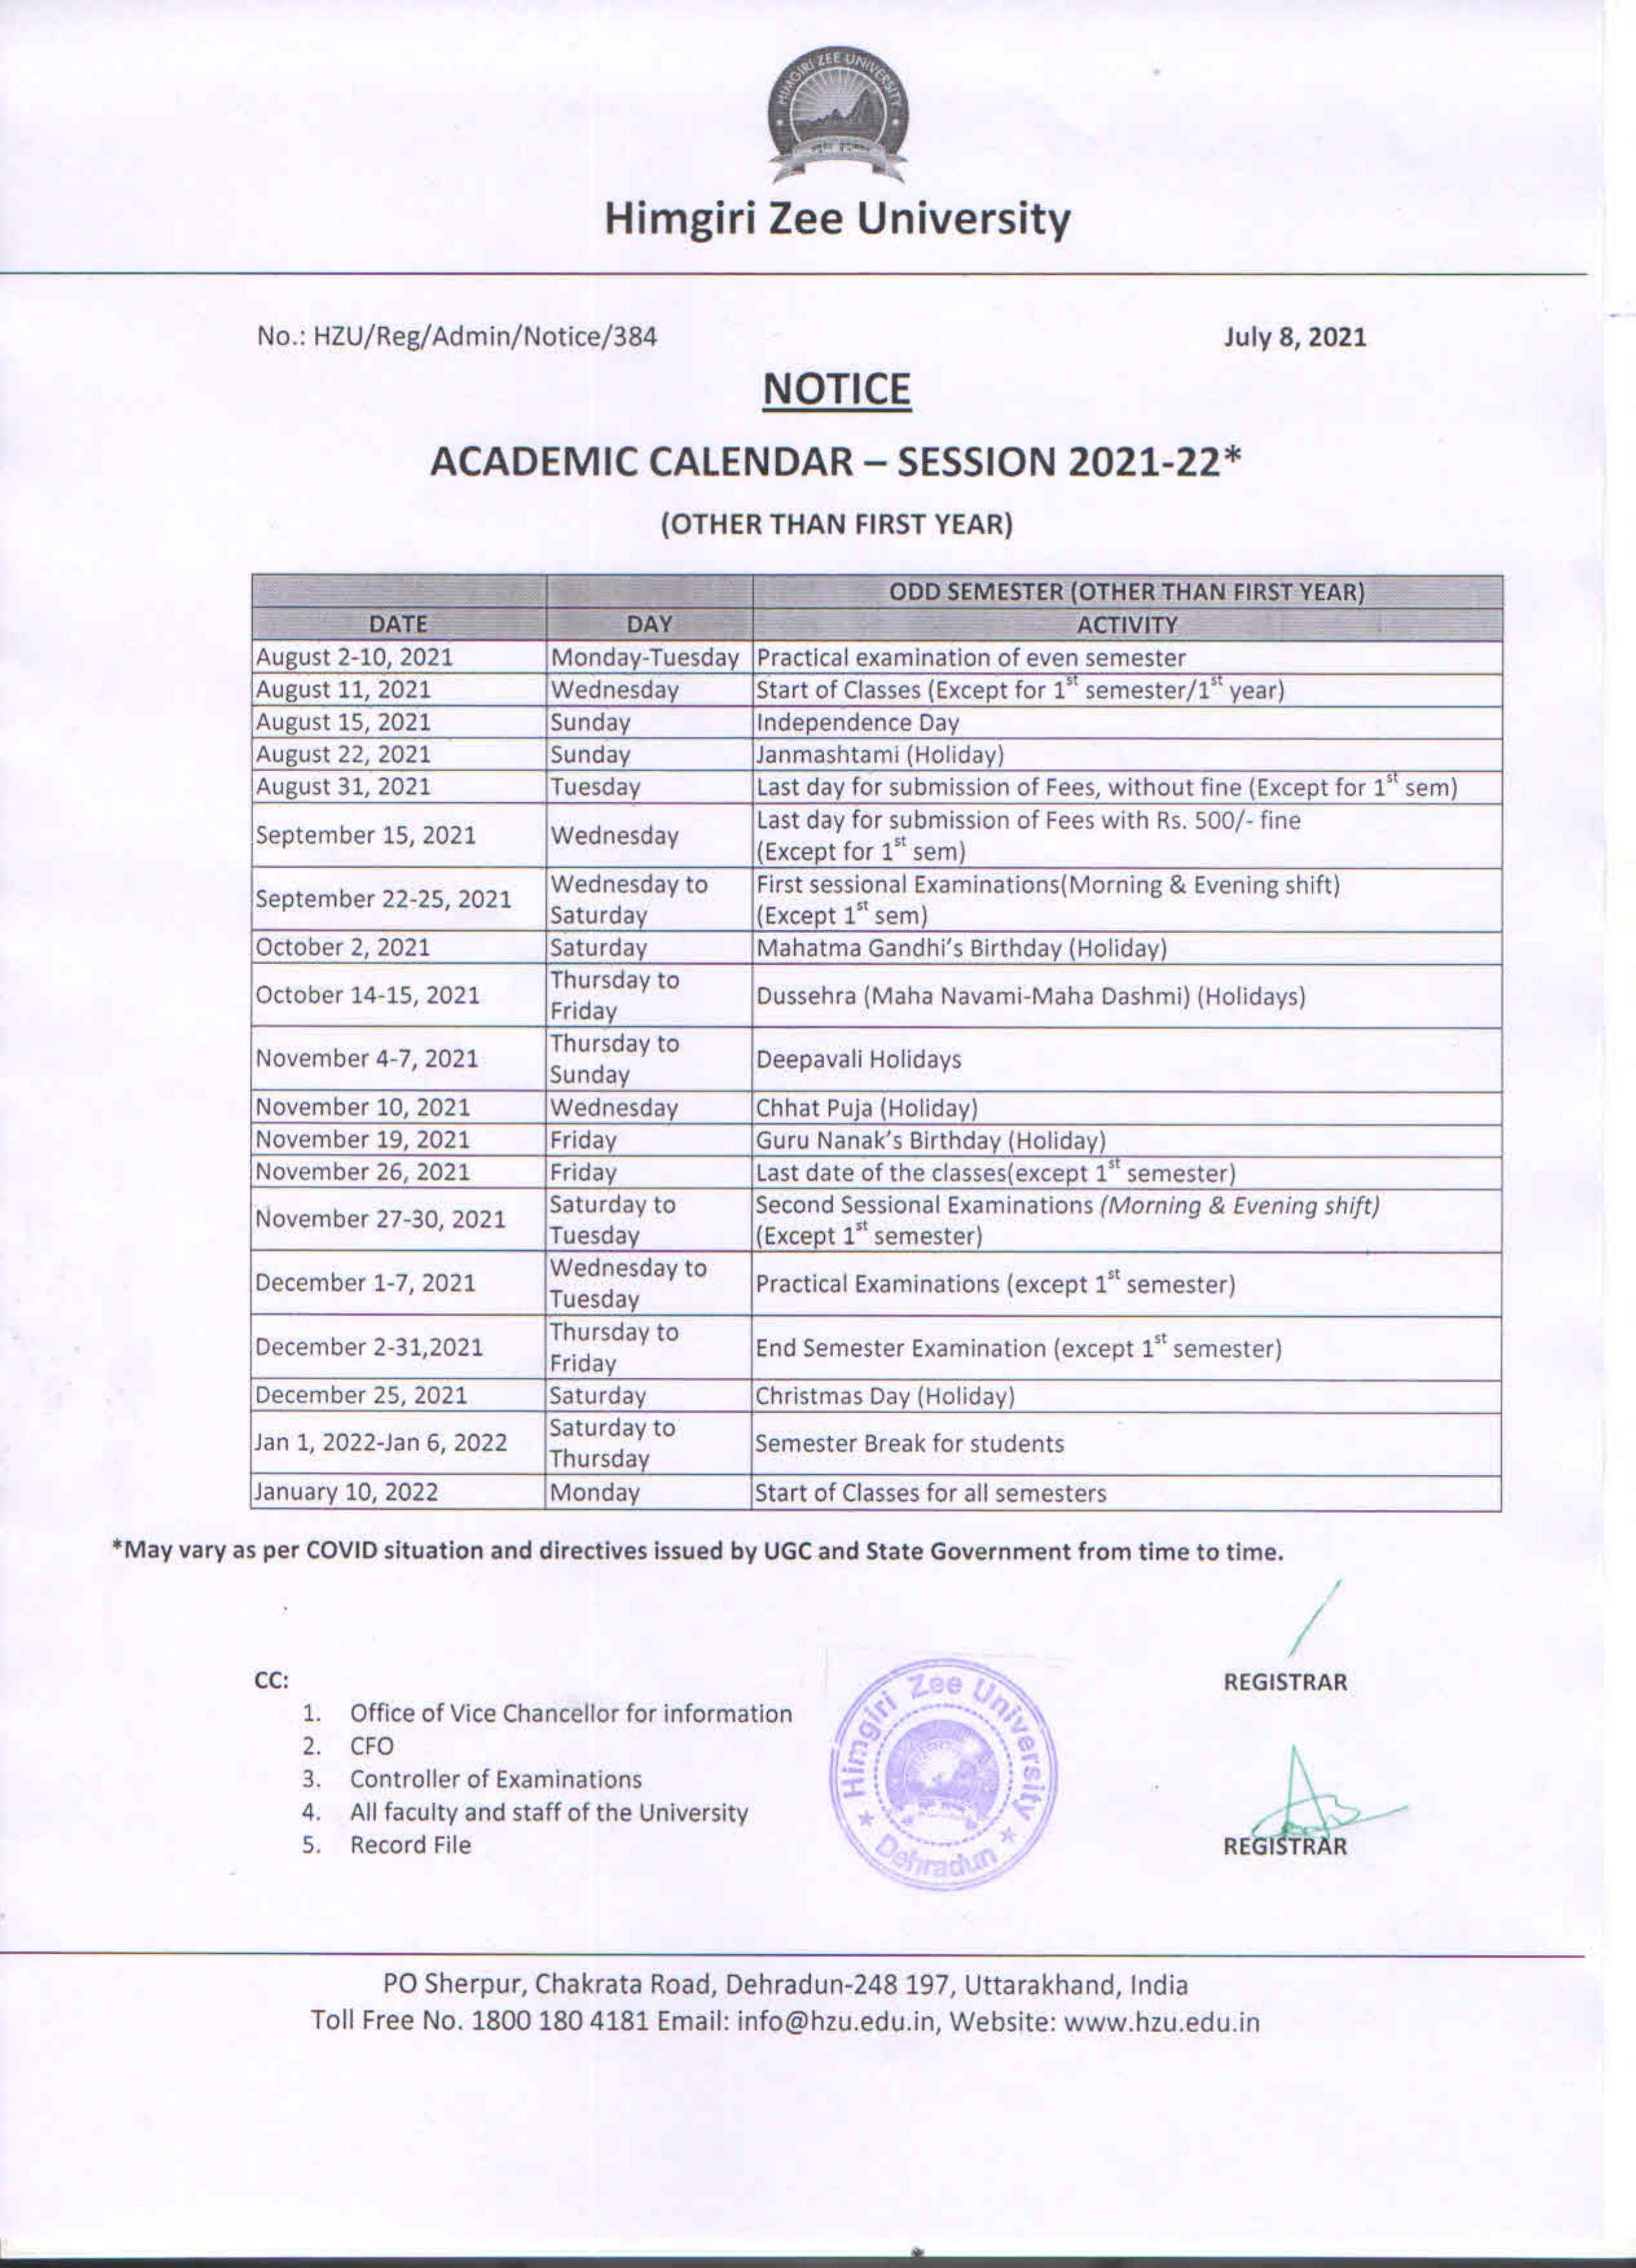 Uncg Academic Calendar Fall 2022.Academic Calender Himigiri Zee University